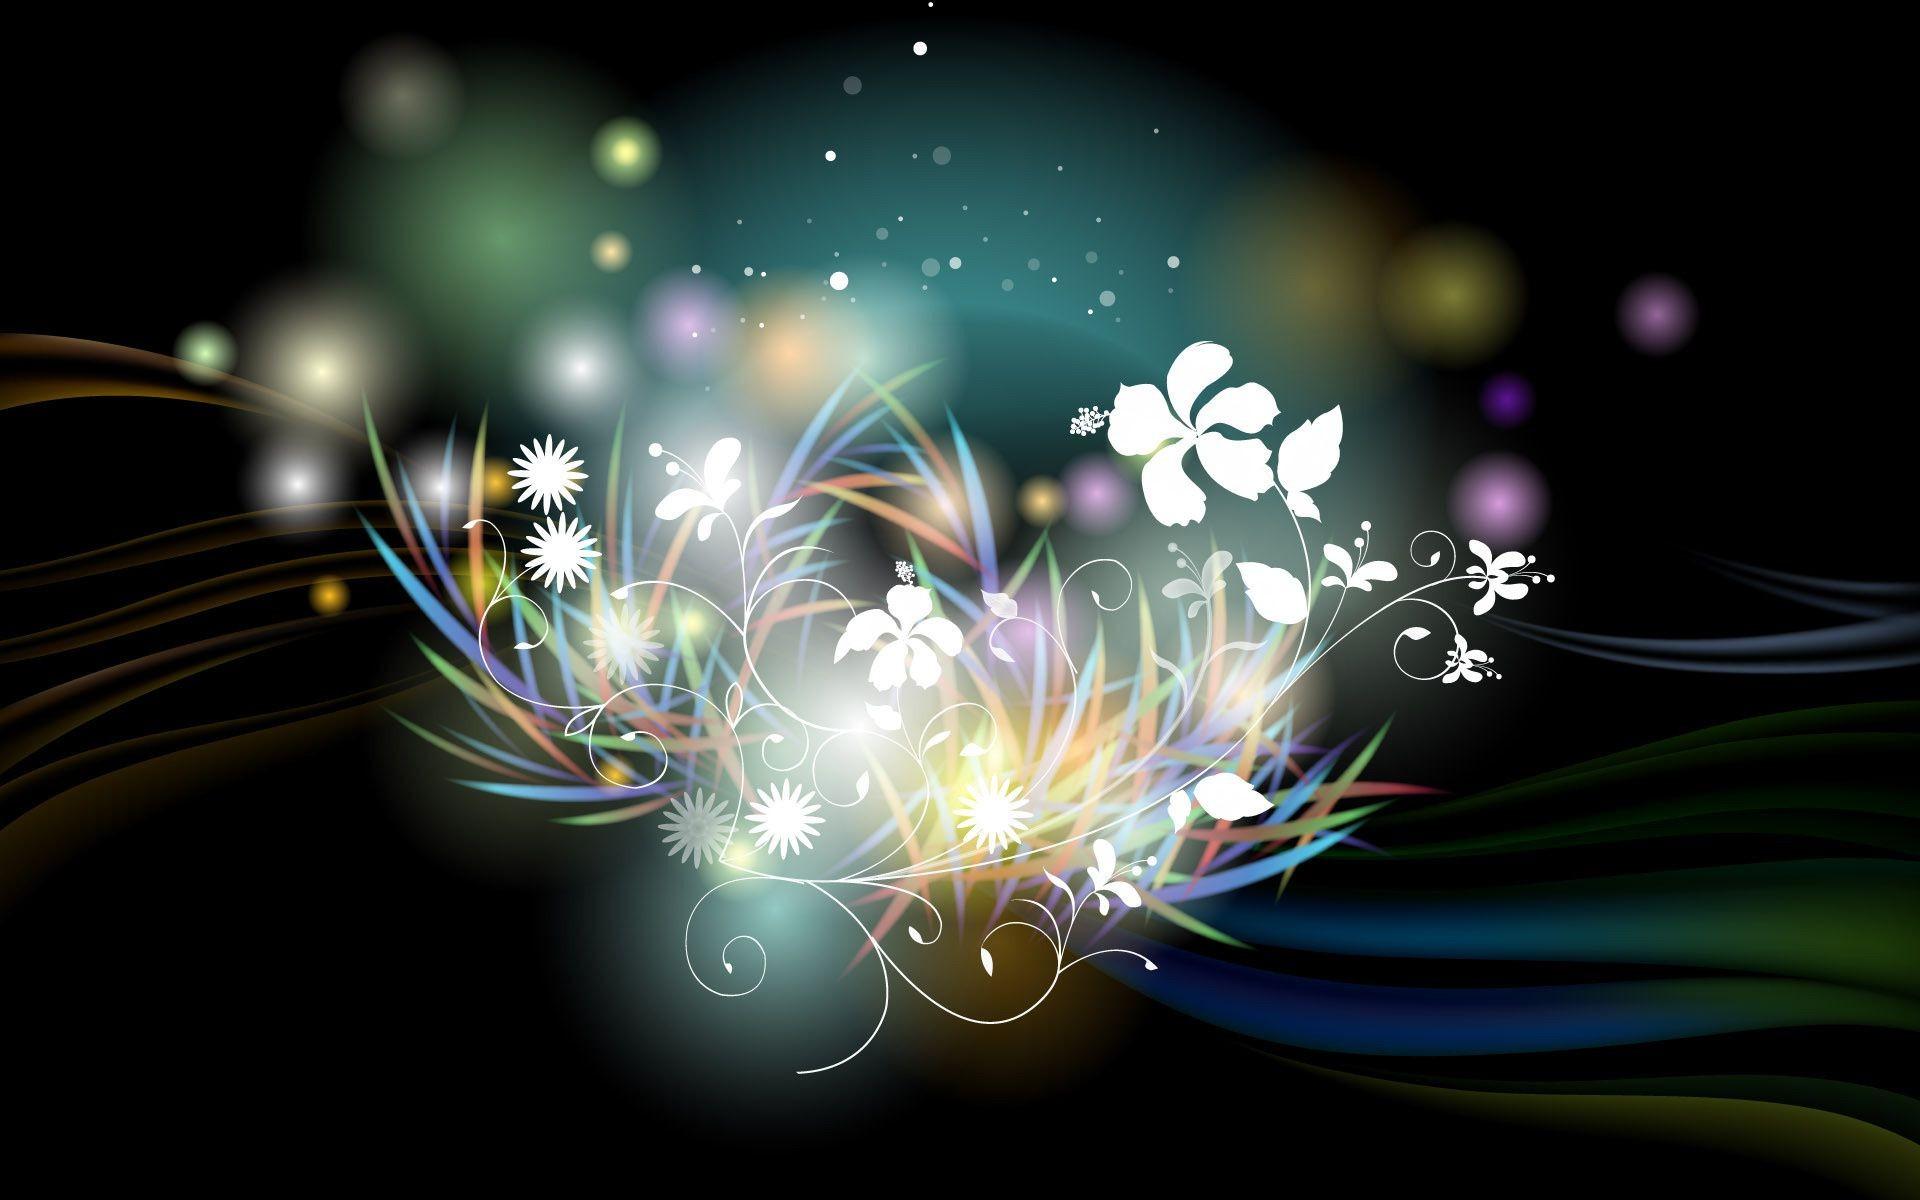 Обои Цвет, Облака, узор, свет. Абстракции foto 10